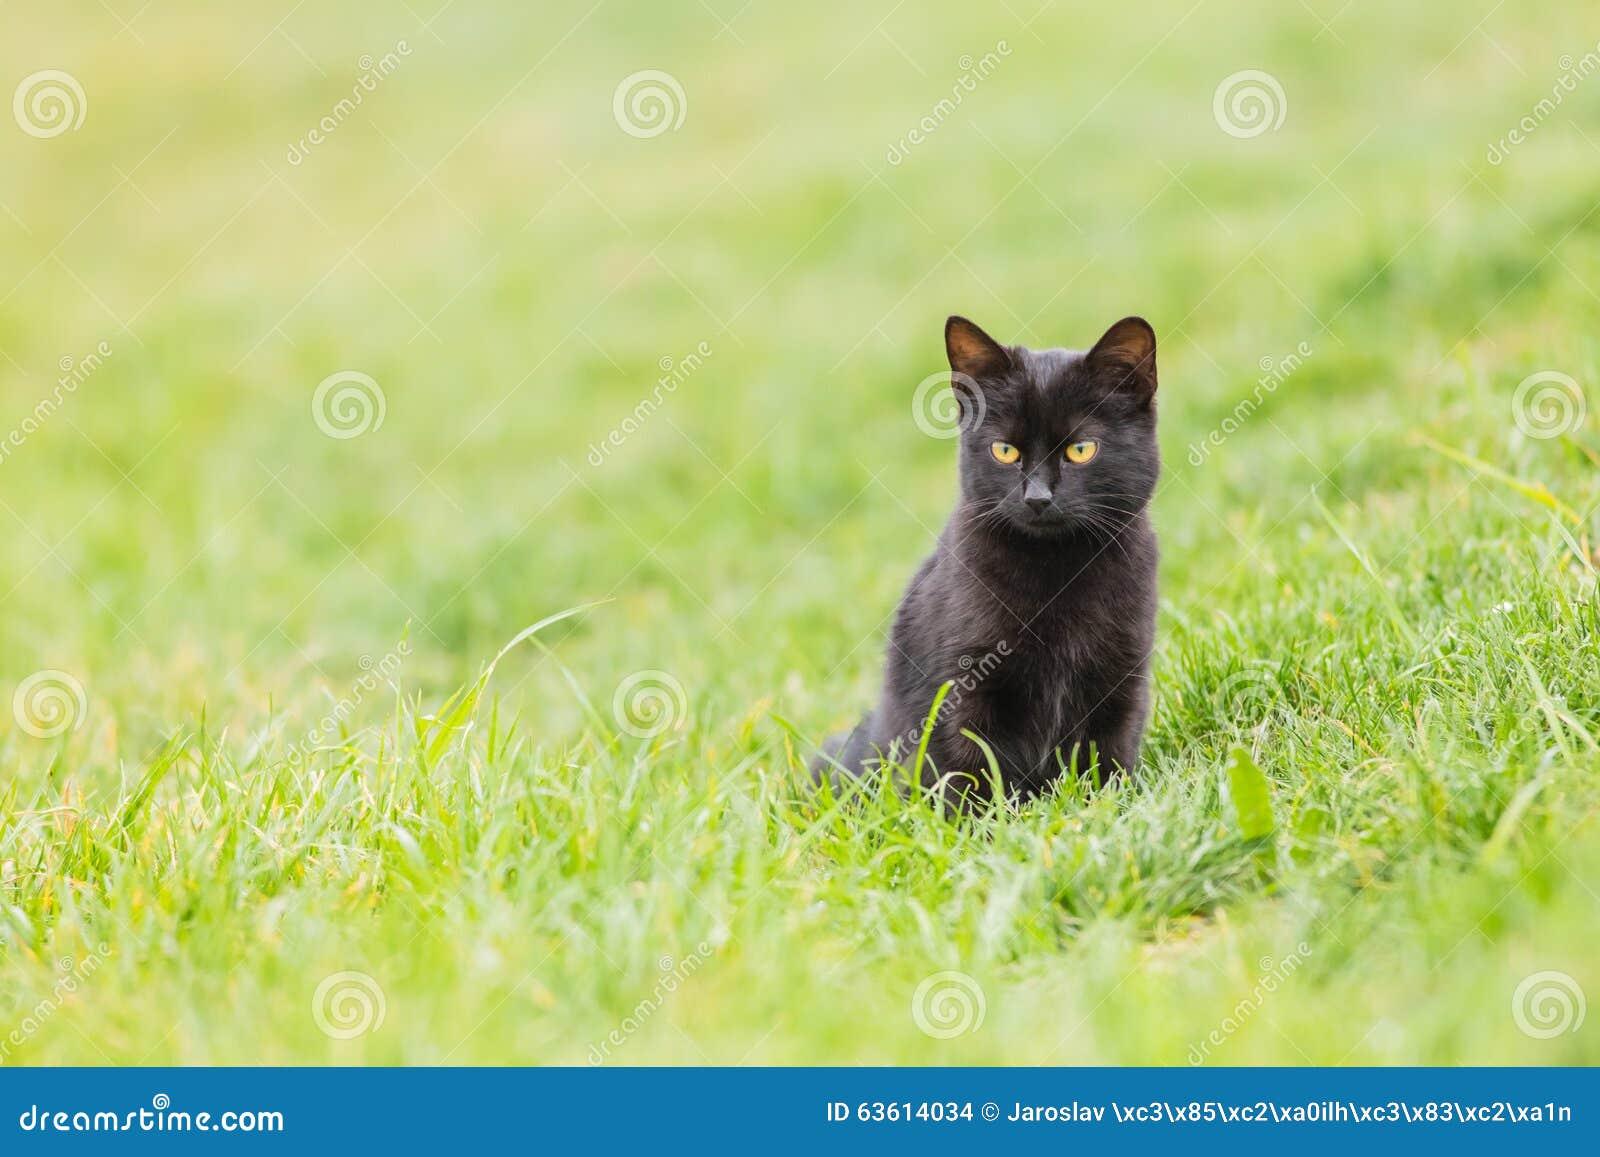 chat noir sur l 39 herbe verte photo stock image 63614034. Black Bedroom Furniture Sets. Home Design Ideas